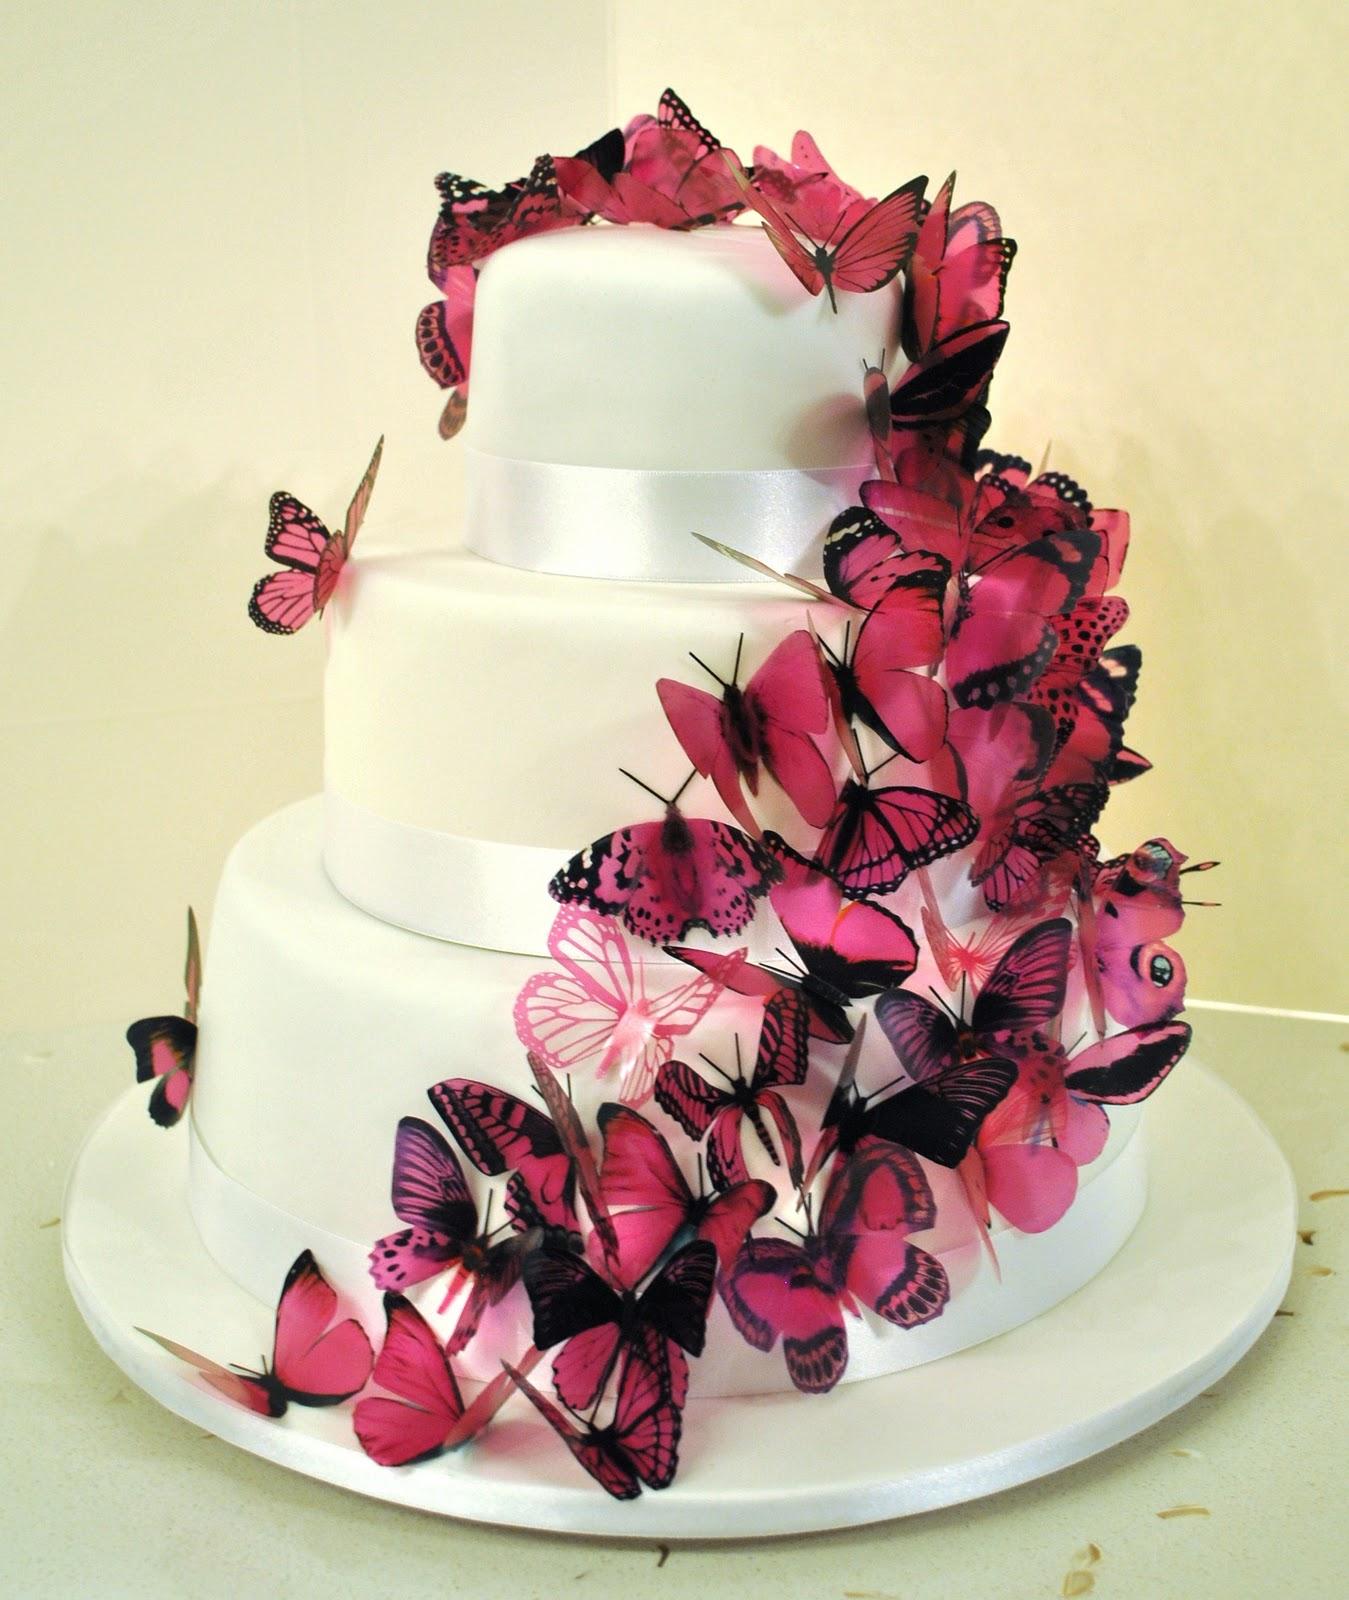 Mariposa Black And White Cake